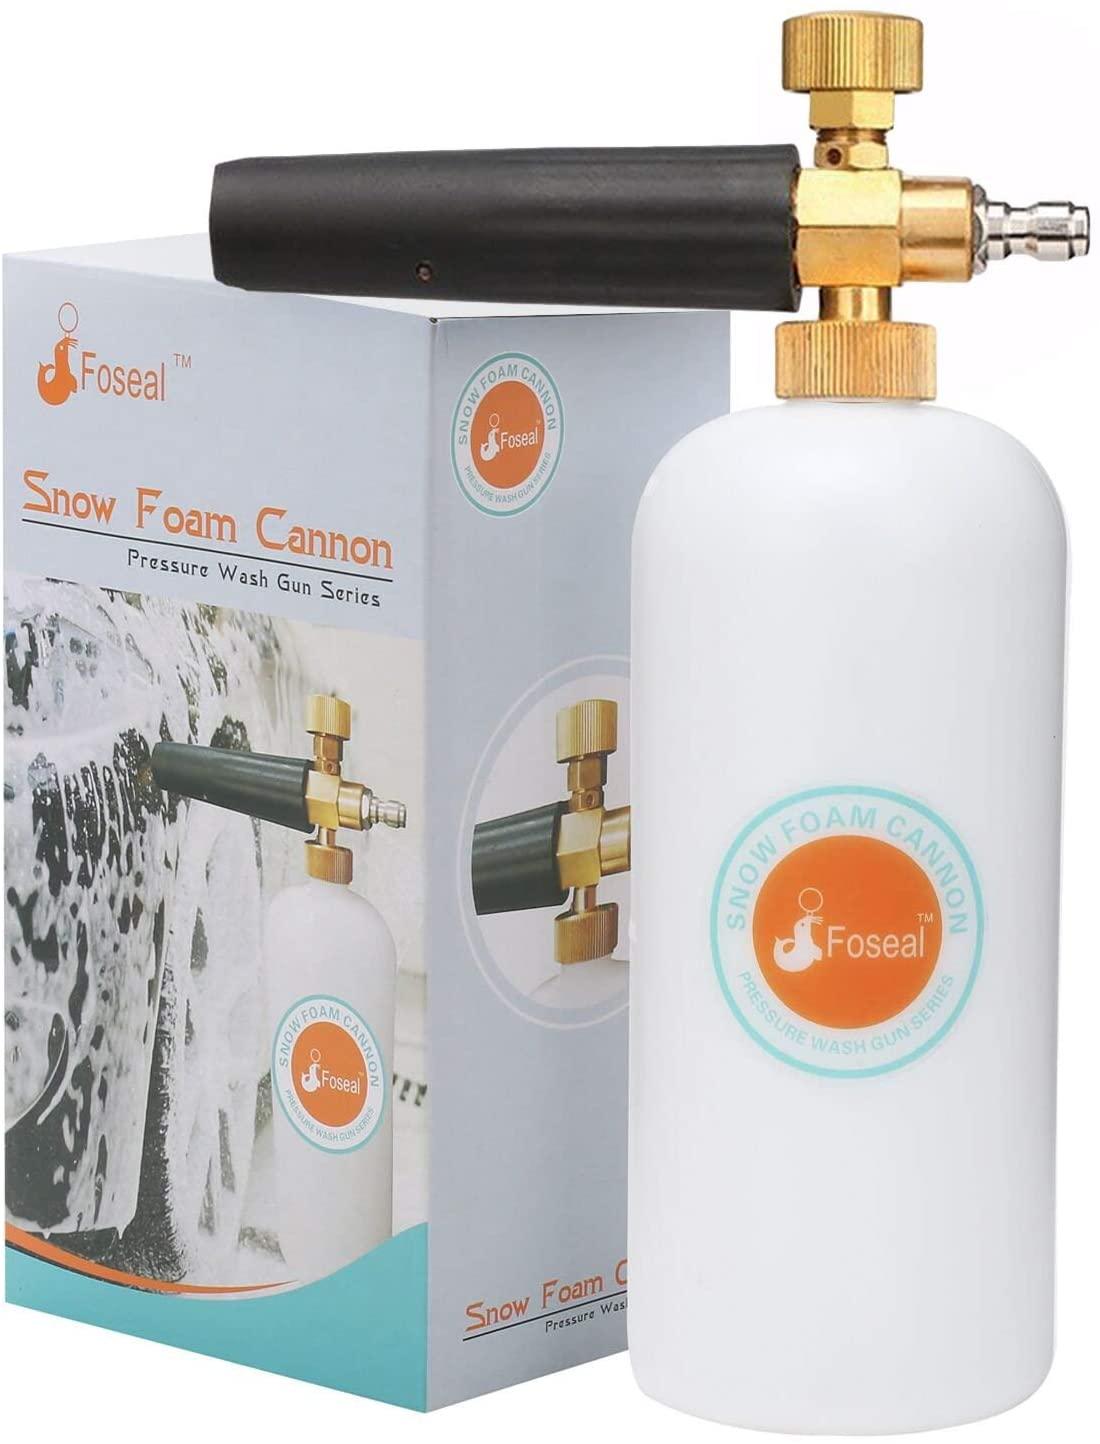 Amazon.com: Foseal Snow Foam Lance Jet Wash Pressure Car Washer Foam Cannon 1L Bottle Adjustable Thick/Watery Soap Foam $12.49